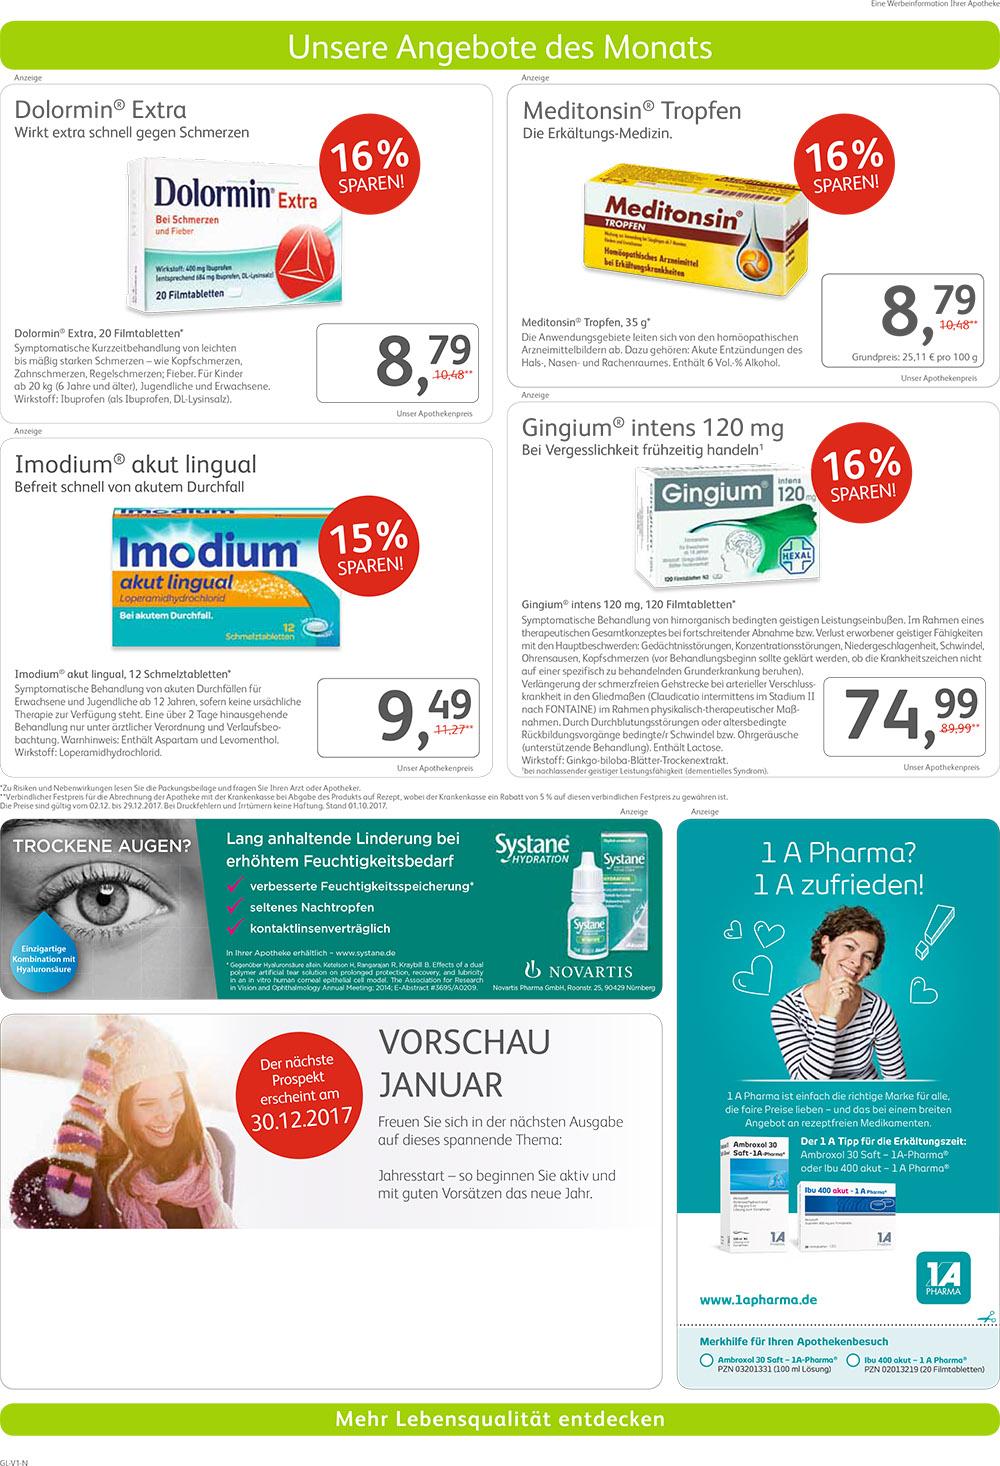 http://www.apotheken.de/fileadmin/clubarea/00000-Angebote/67459_5899_rehbach_angebot_4.jpg